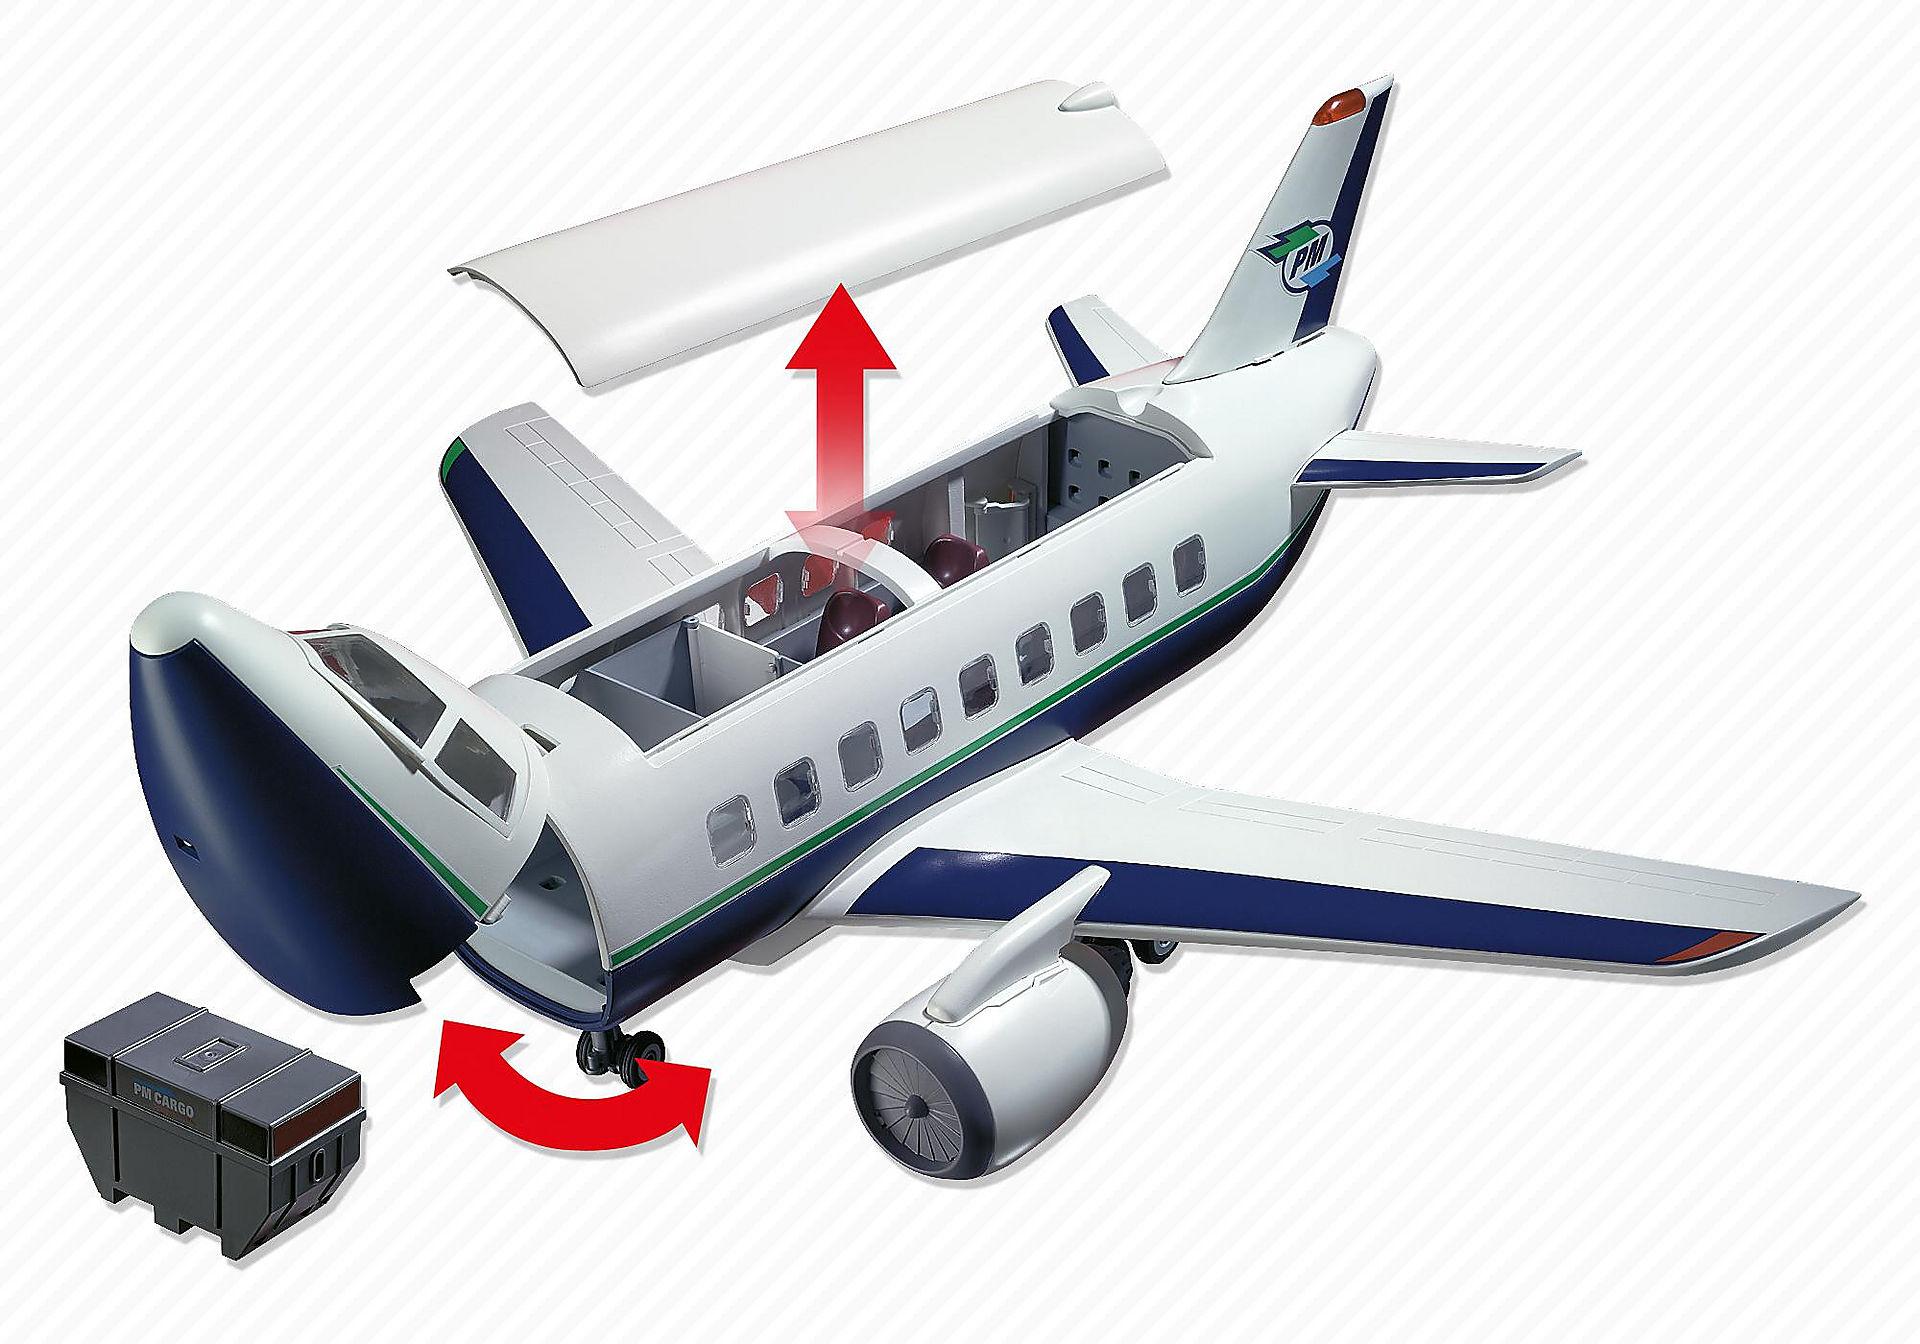 5261 Cargo- und Passagierflugzeug zoom image5